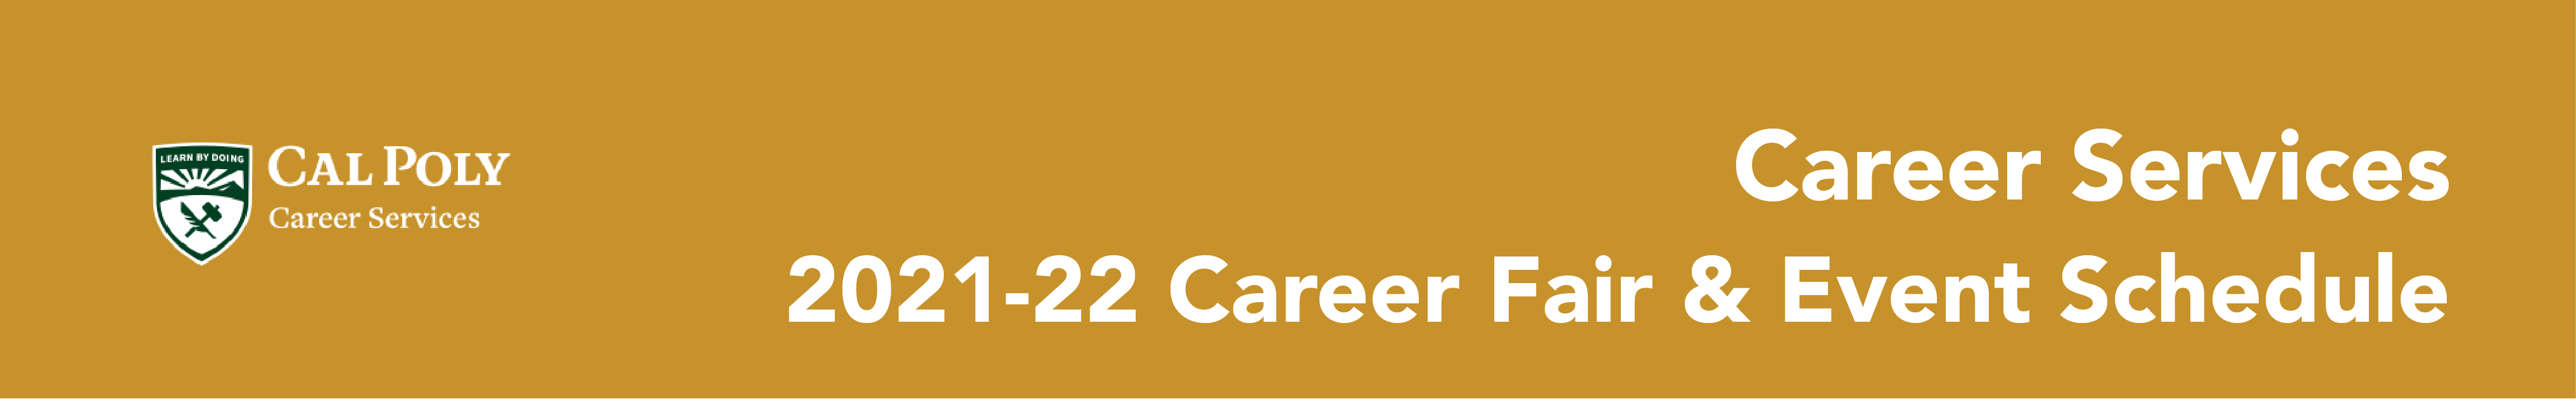 Career Fair Schedule 2021-2022